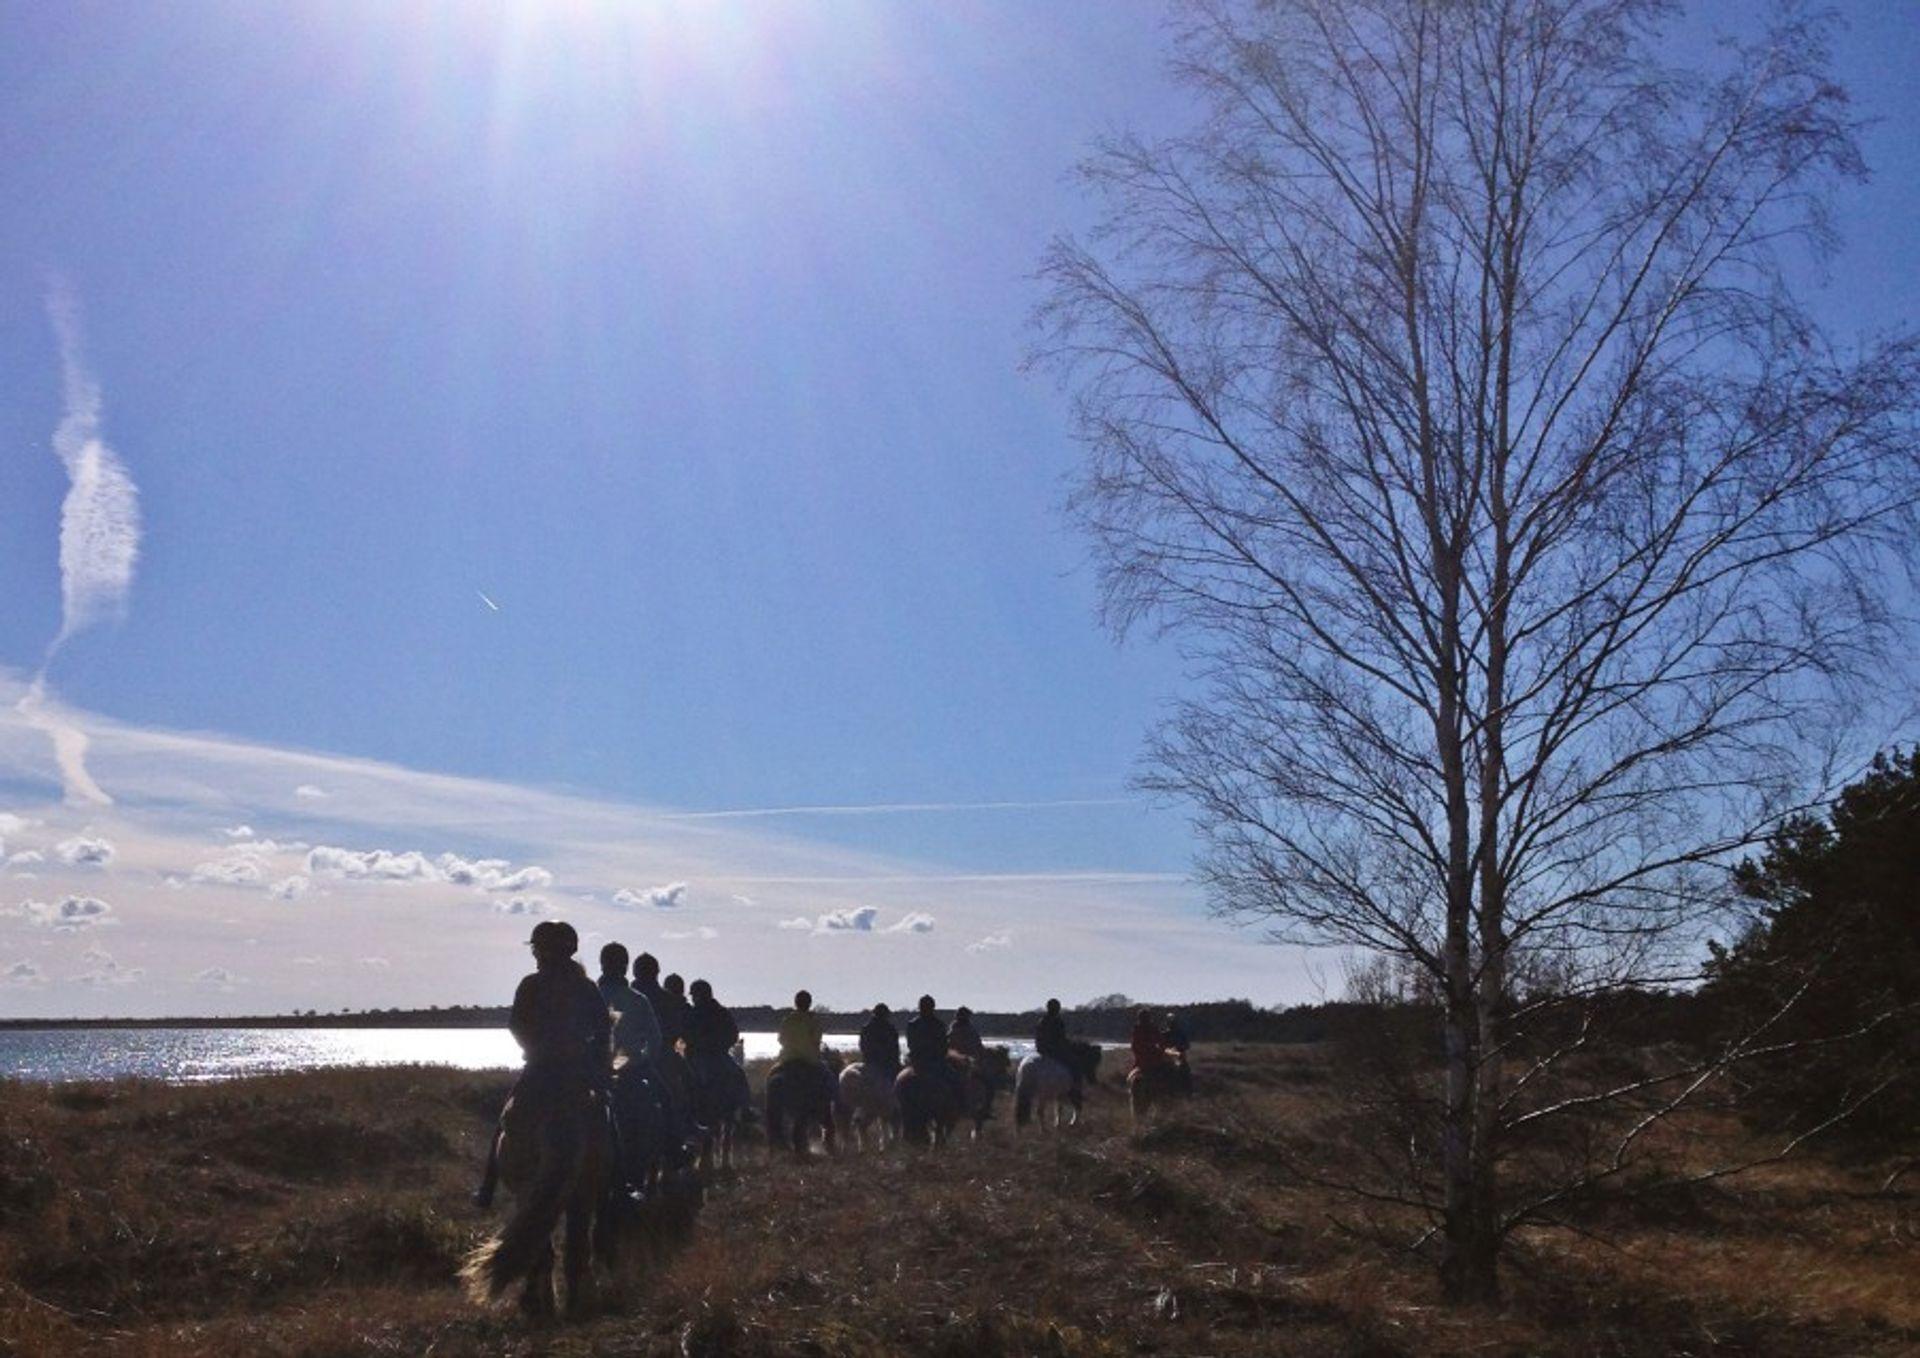 Riding on Icelandic horses in Fårö